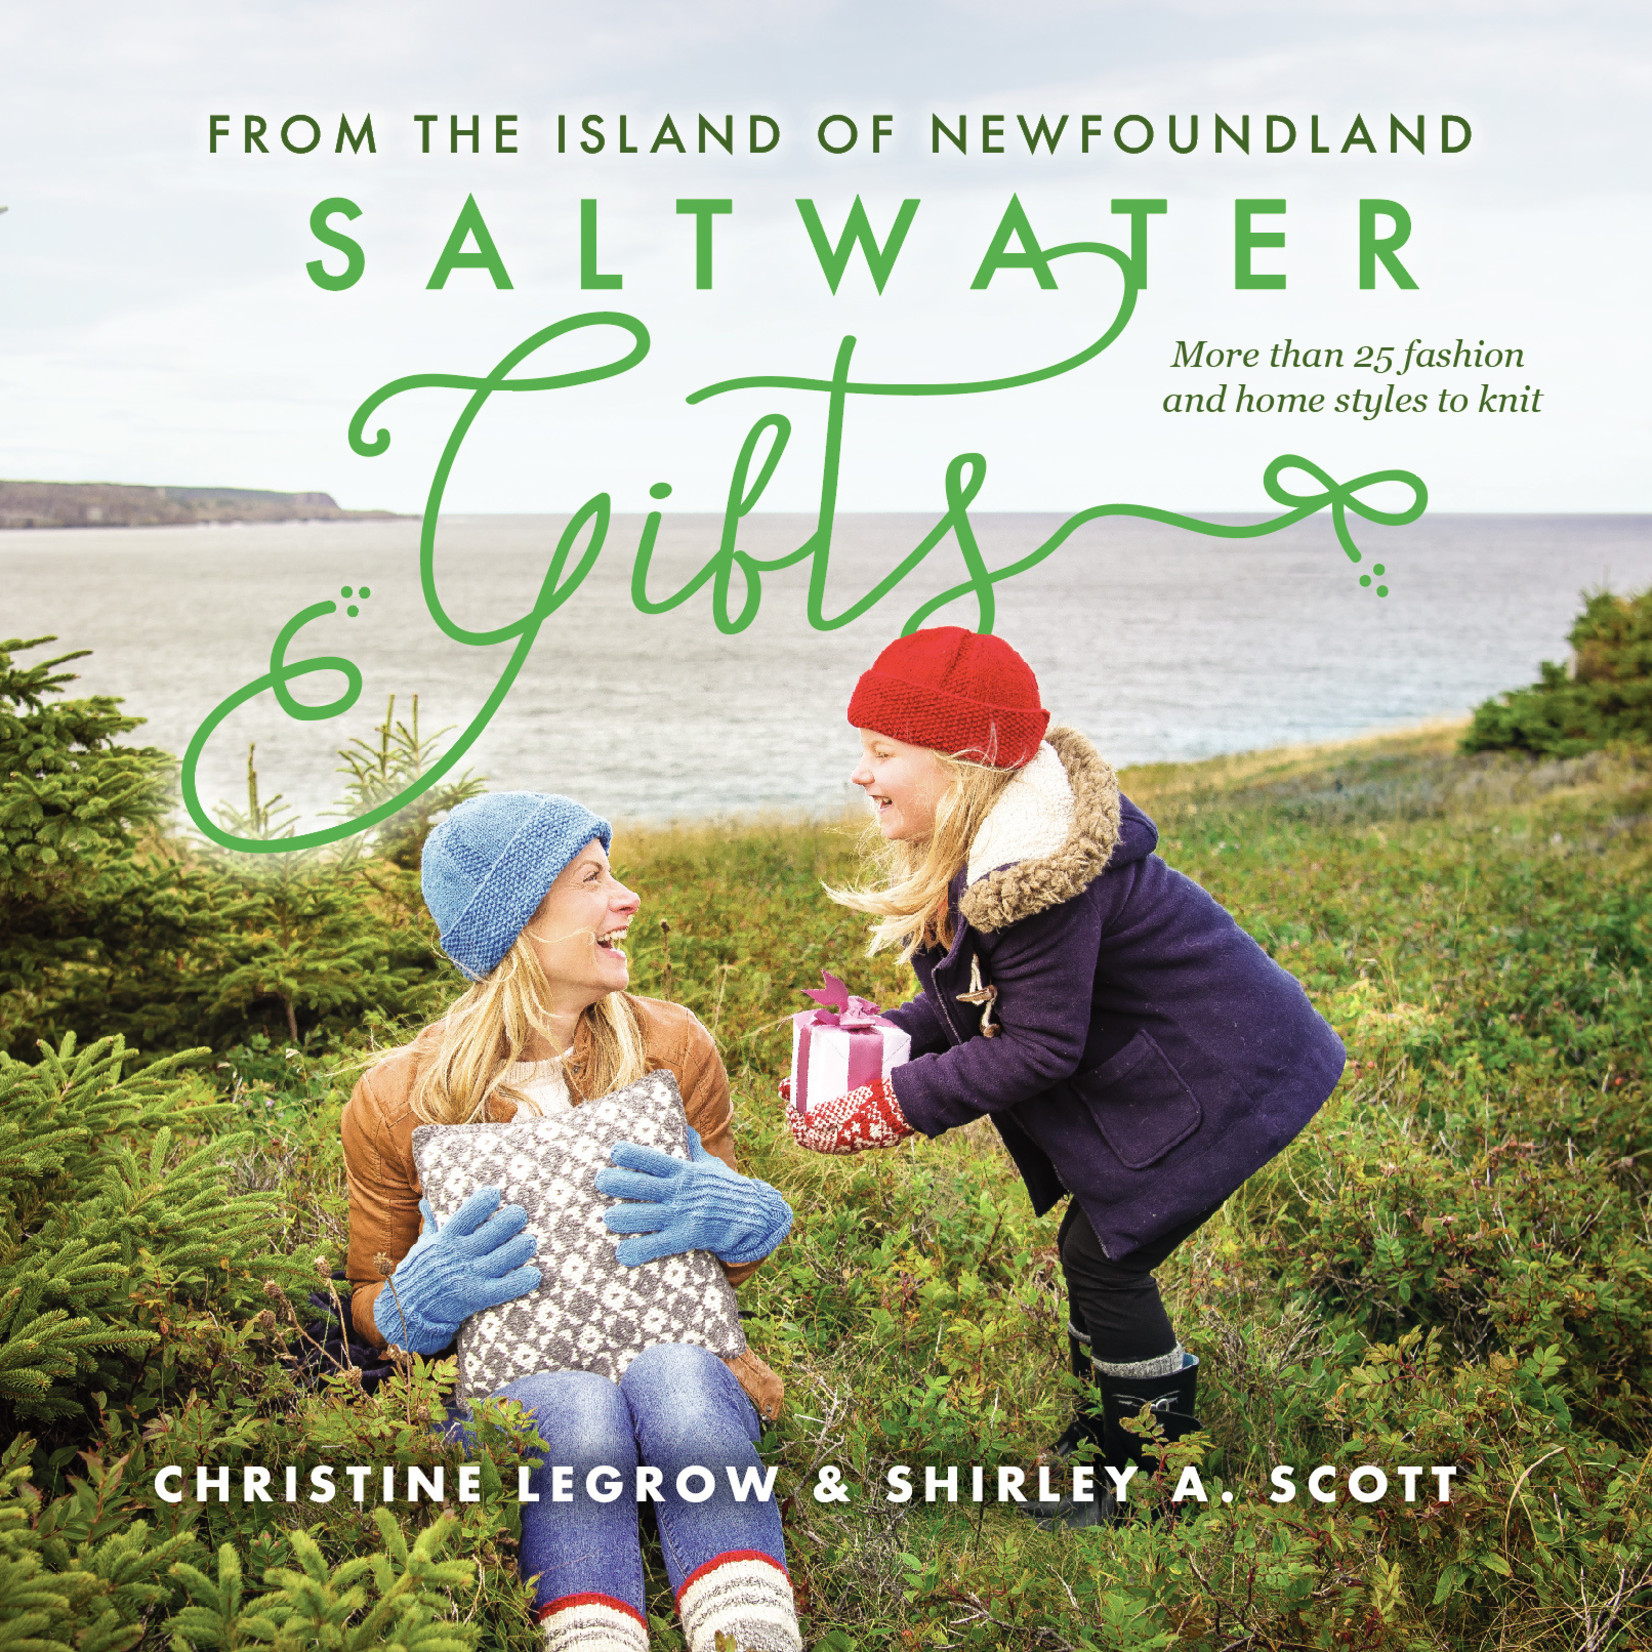 Saltwater Saltwater Gifts